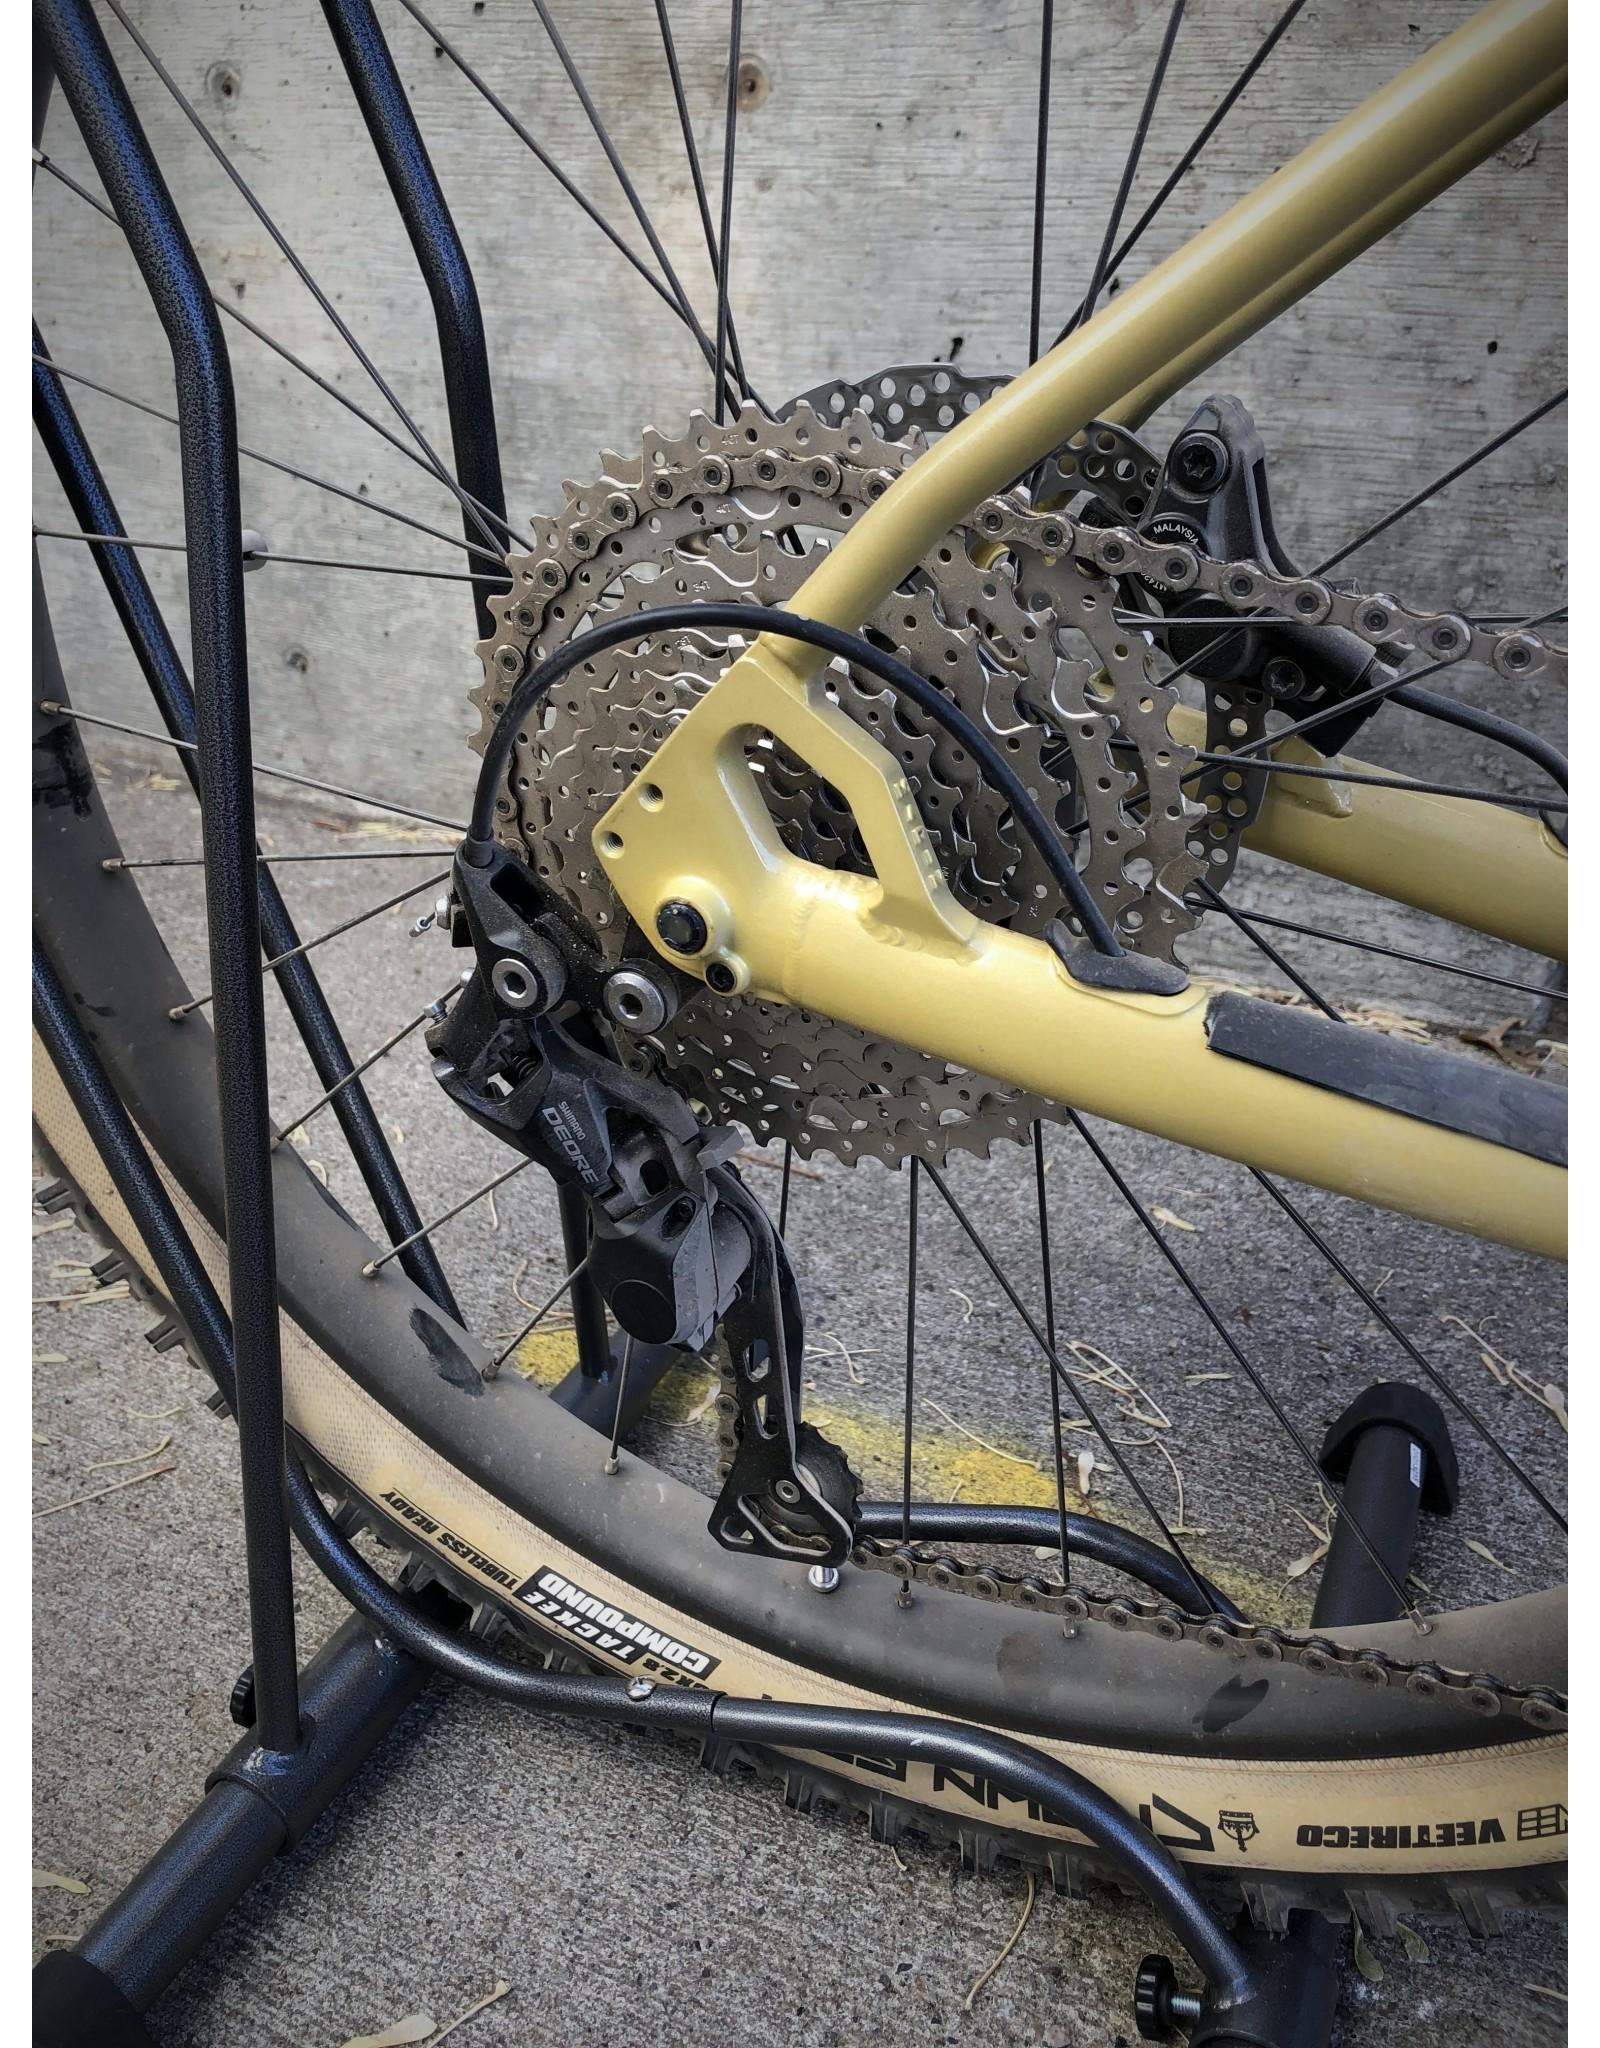 Marin Bikes USED/DEMO: 2020 Marin Pine Mountain E1